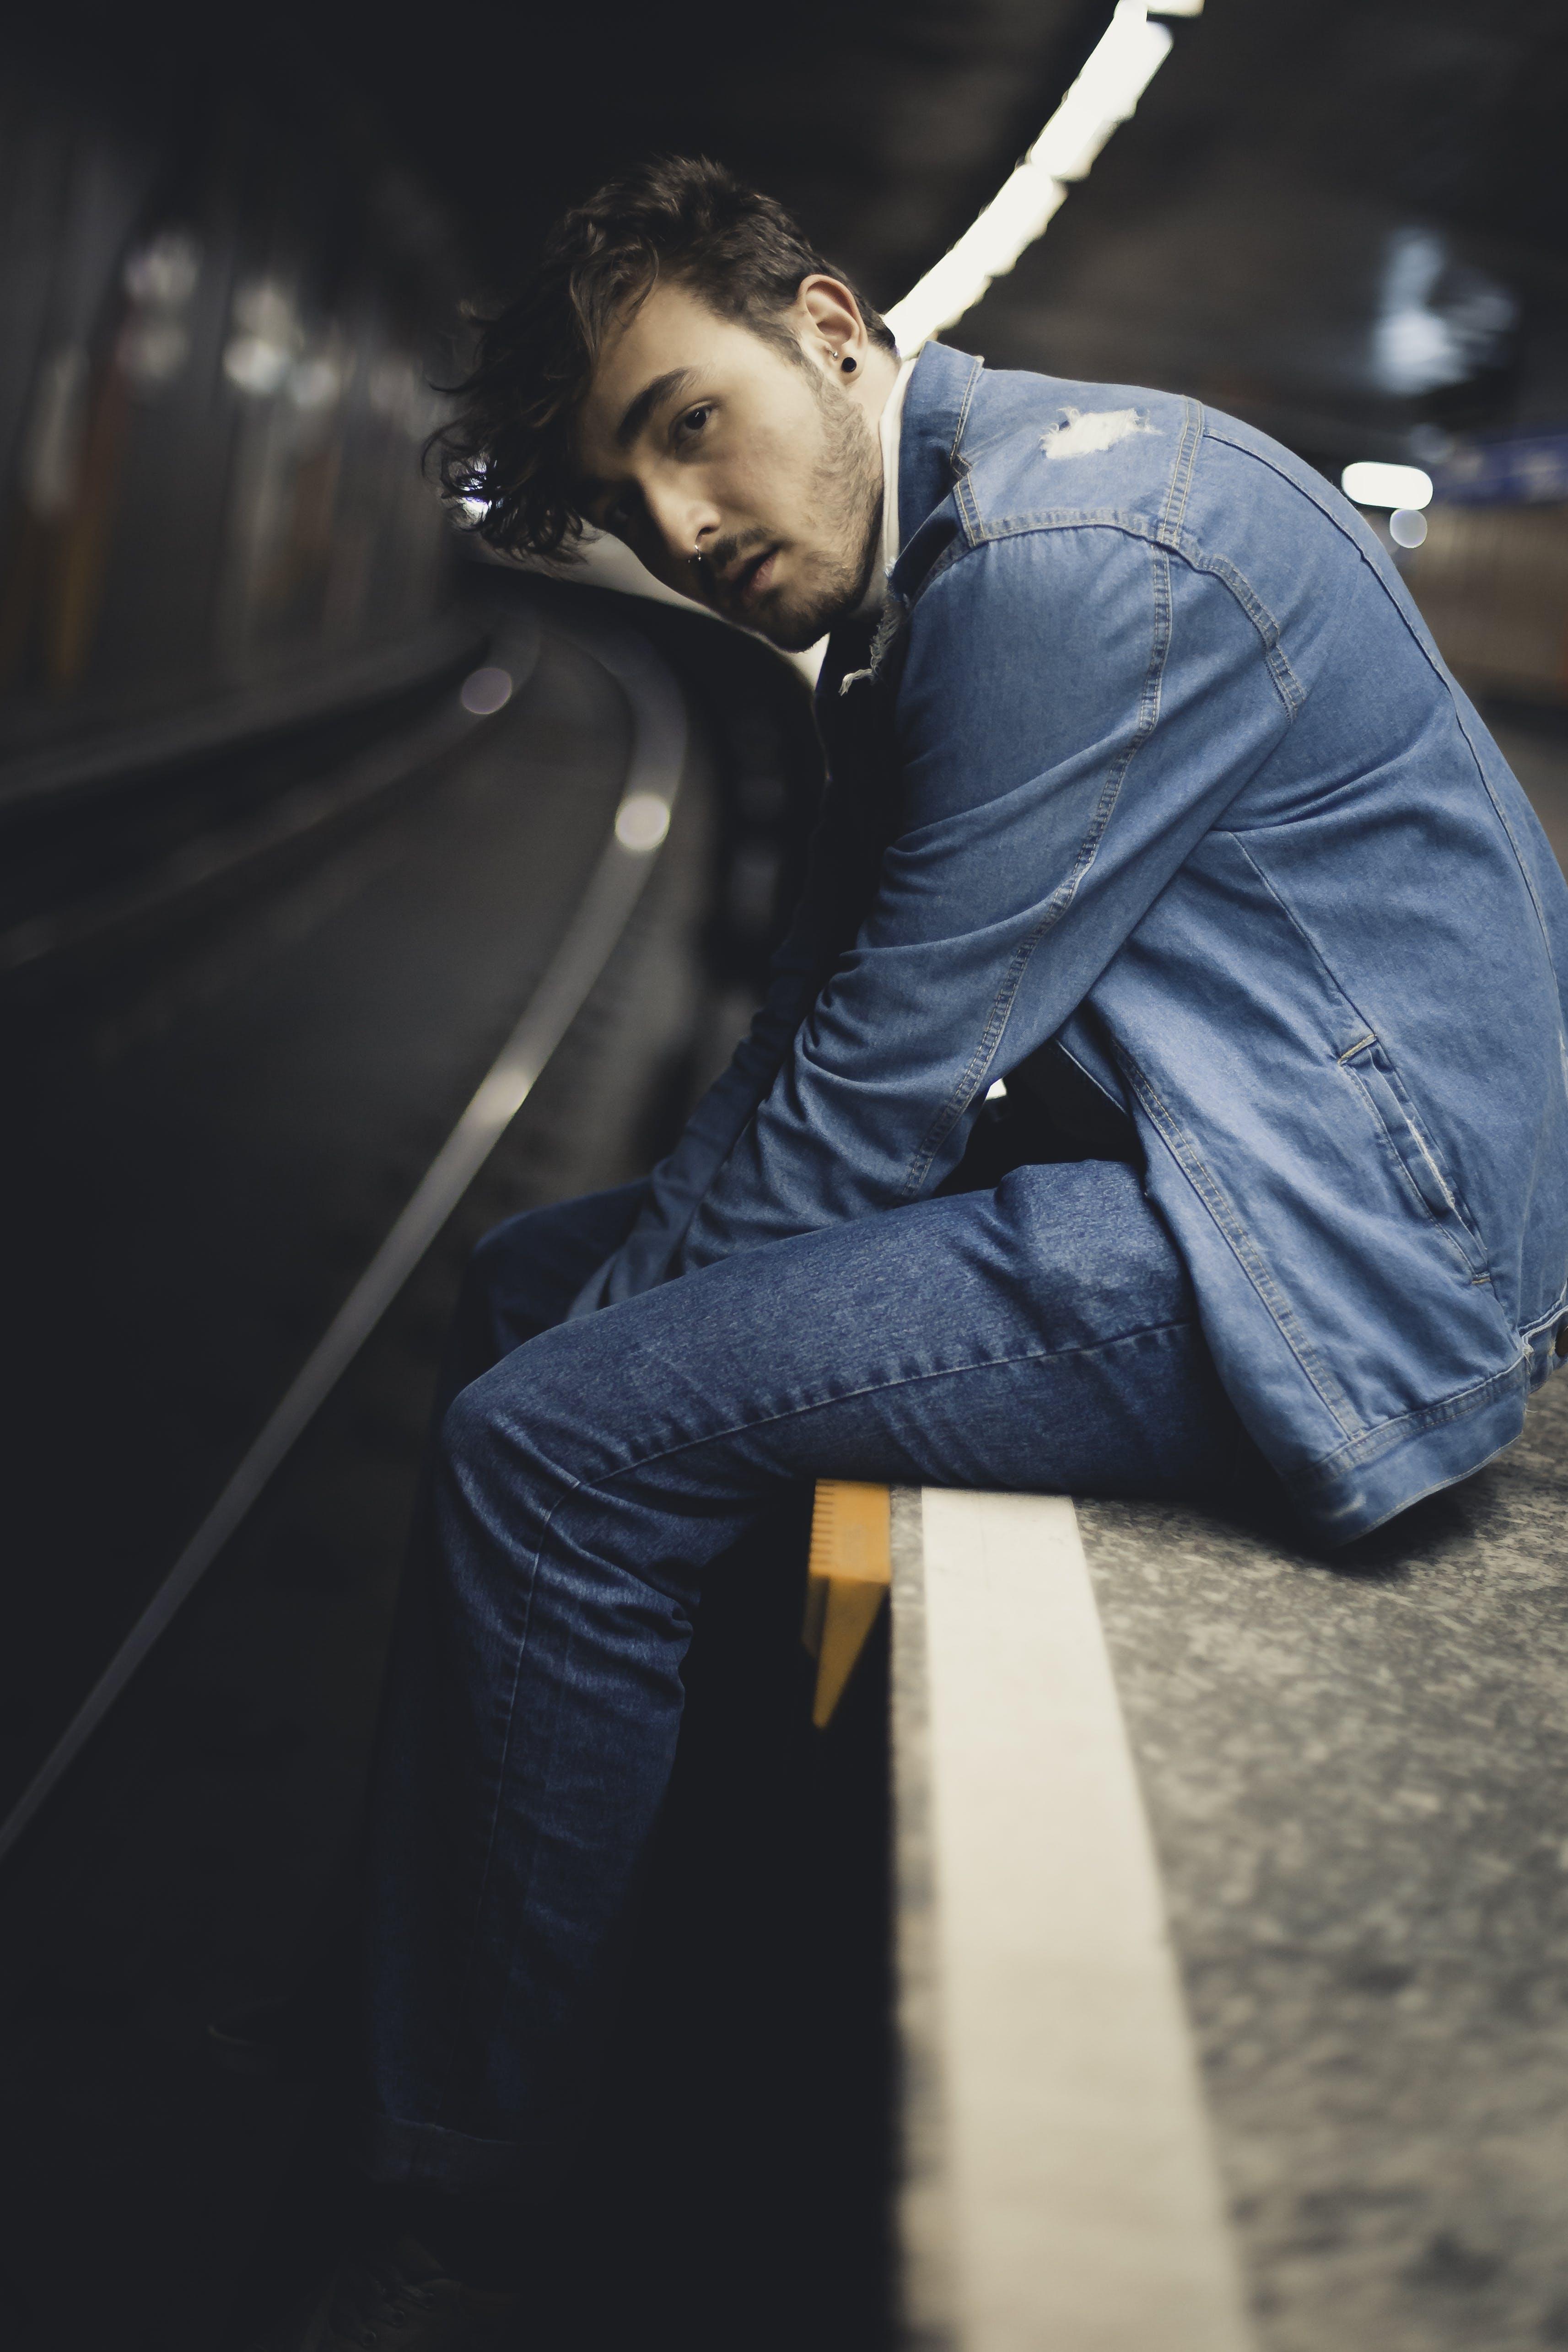 Man Wearing Blue Denim Jacket and Blue Denim Jeans Sitting on Gray Surface